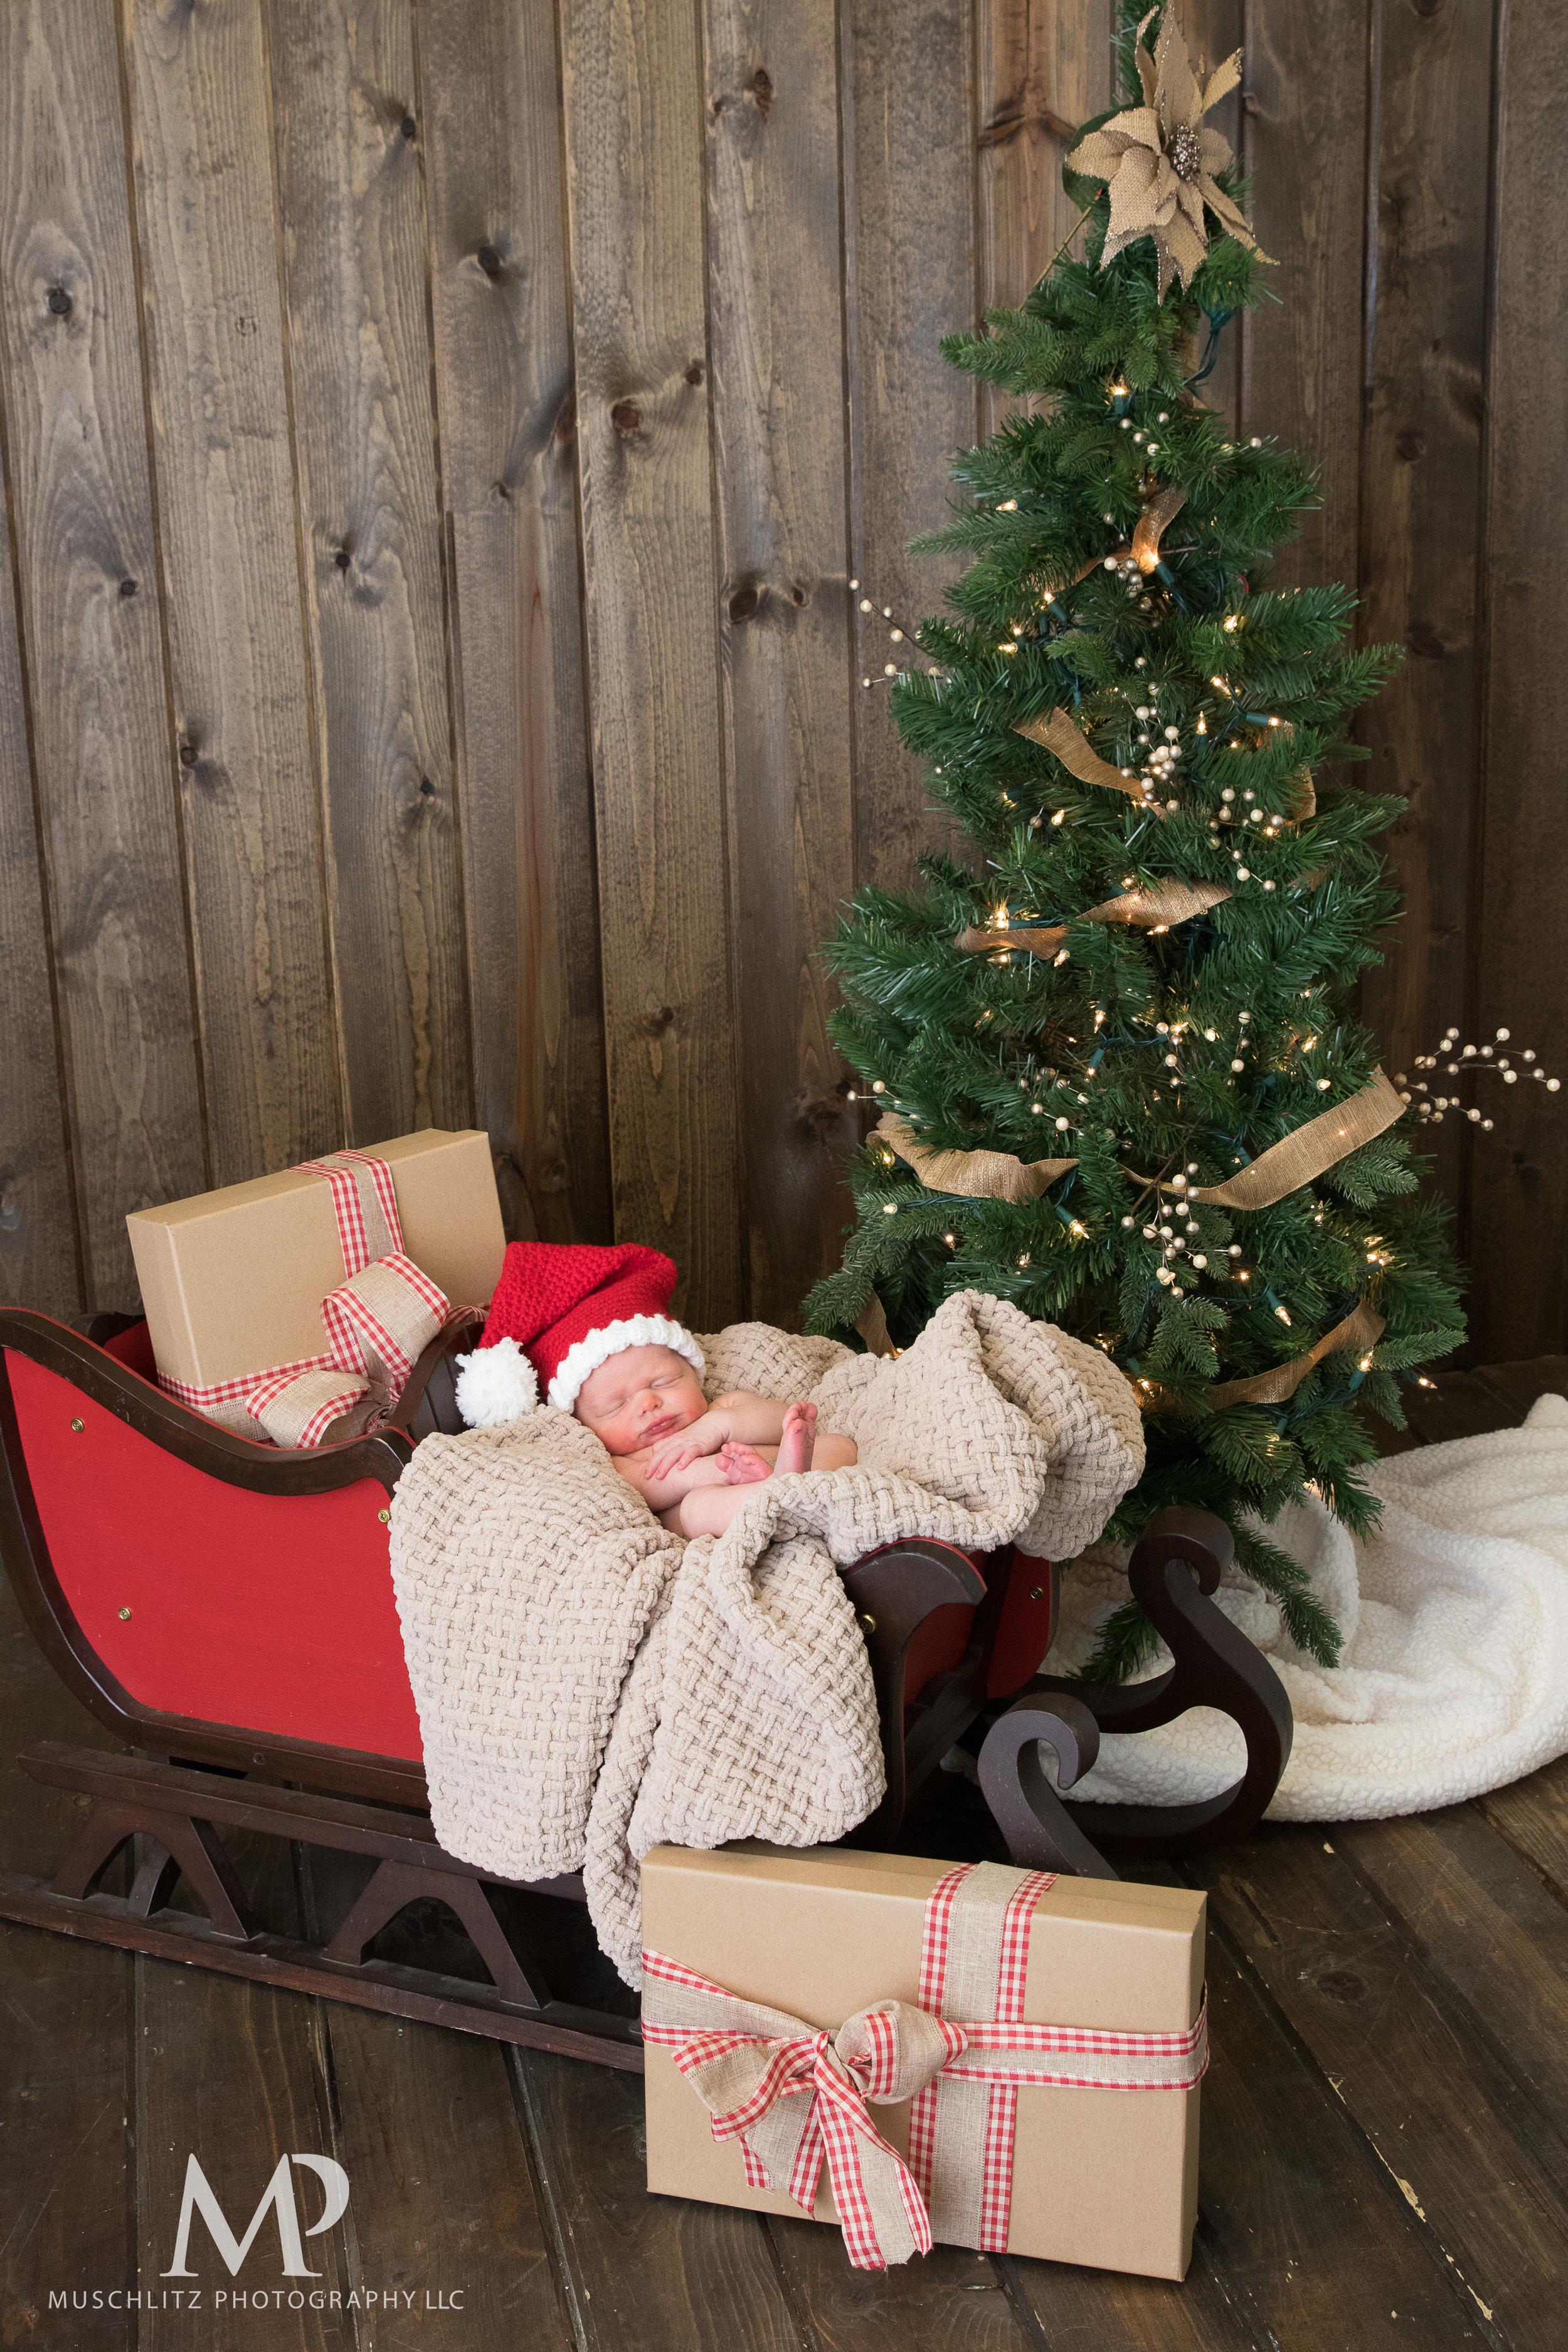 newborn-baby-portraits-photos-studio-holiday-columbus-gahanna-ohio-muschlitz-photography-006.JPG